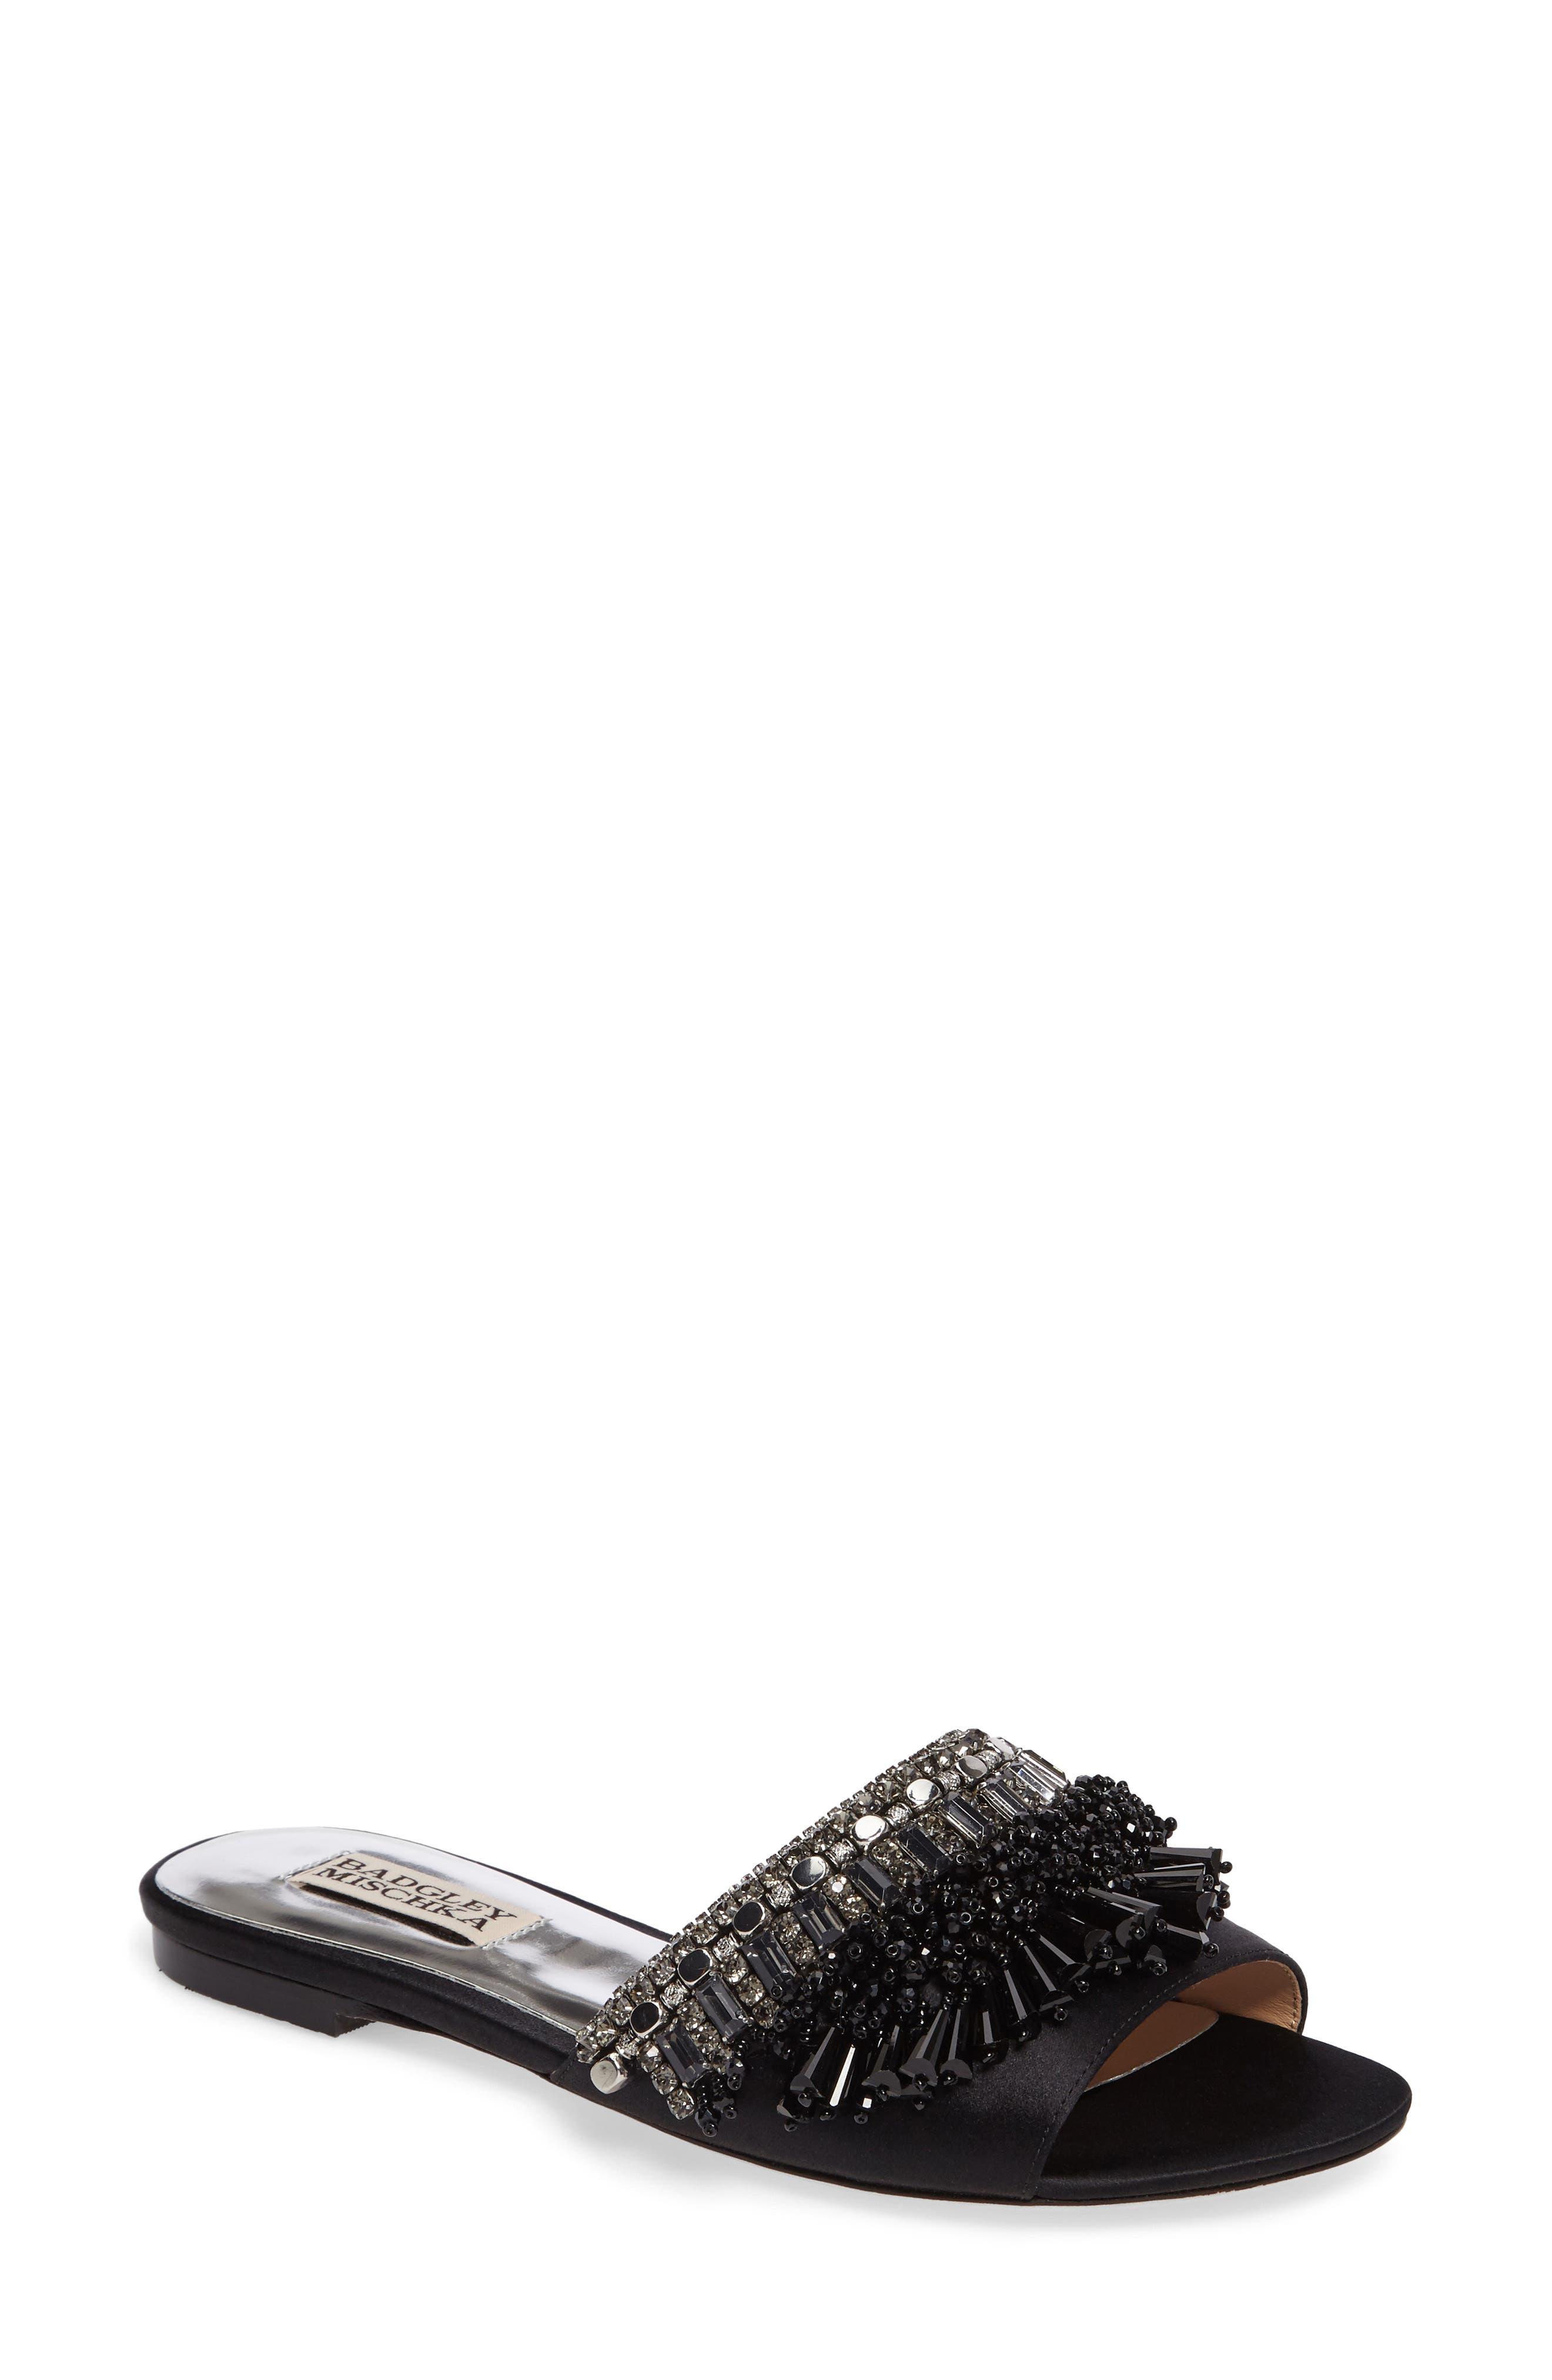 Main Image - Badgley Mischka Kassandra Embellished Slide Sandal (Women)